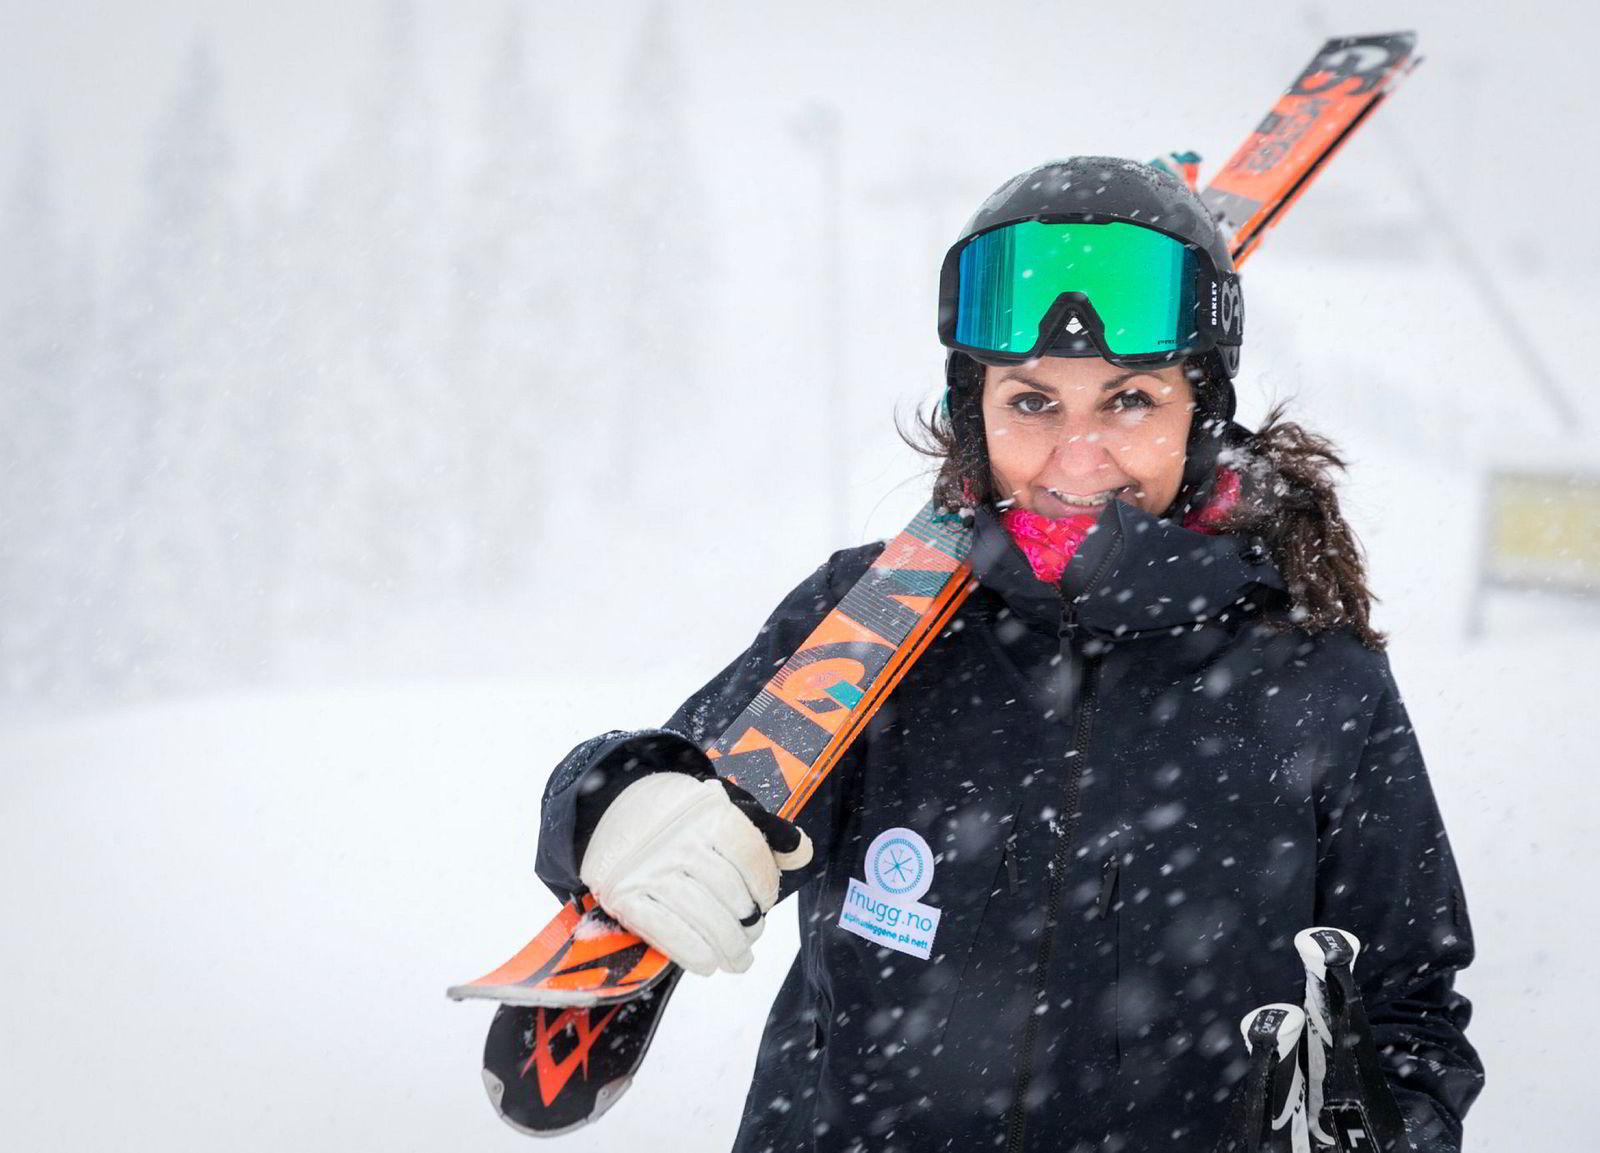 Generalsekretær Camilla Sylling Clausen i Alpinanleggenes Landsforening.